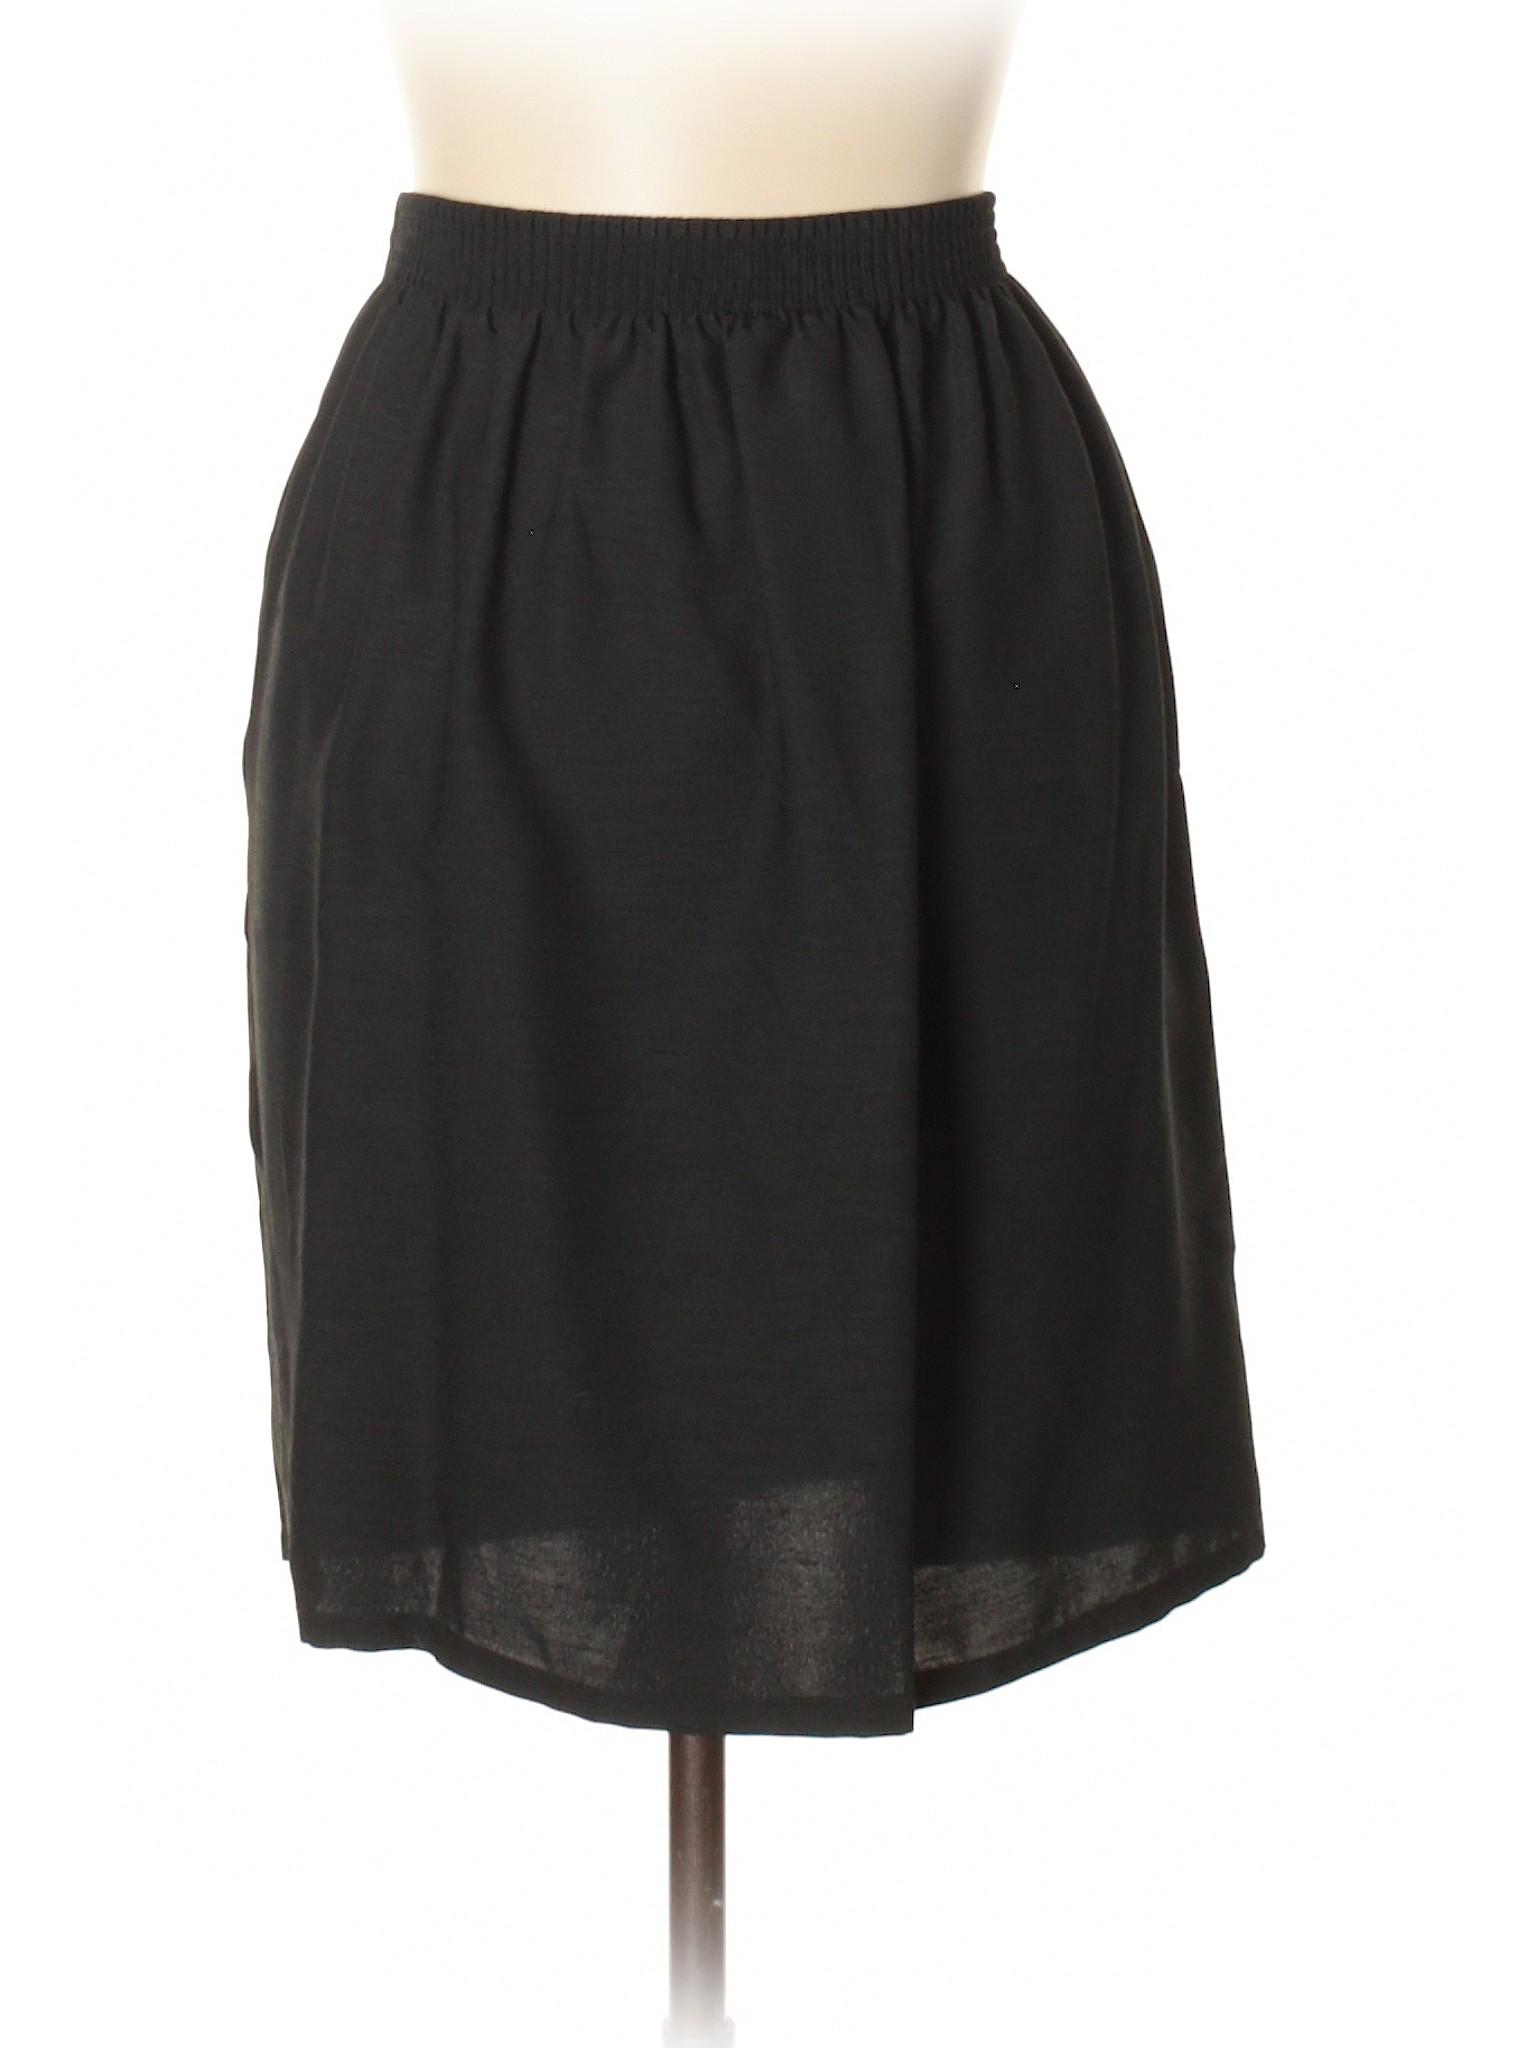 Skirt Casual Casual Boutique Boutique Boutique Skirt Skirt Skirt Casual Boutique Casual xTHgTf